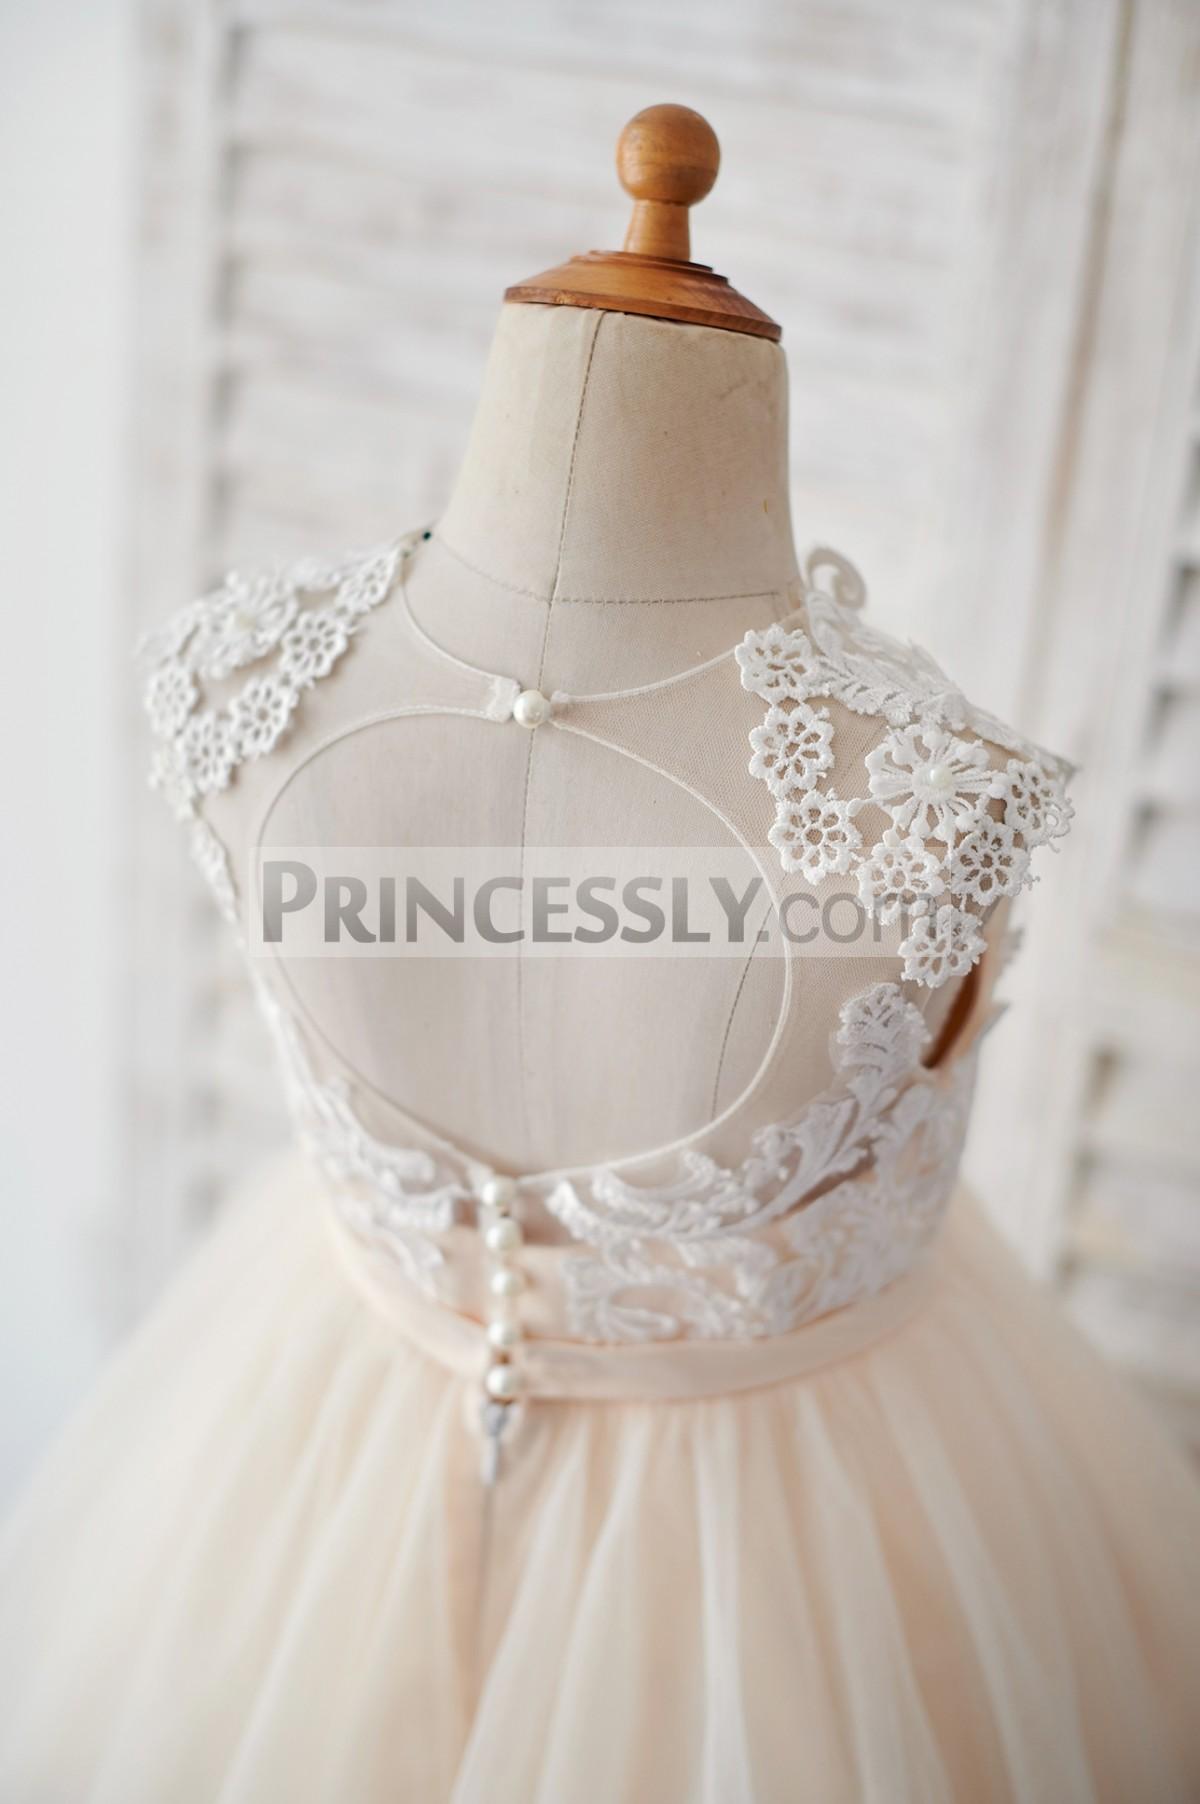 Princessly.com-K1003887-Champagne Tulle Ivory Lace Keyhole Back Wedding Flower Girl Dress-31